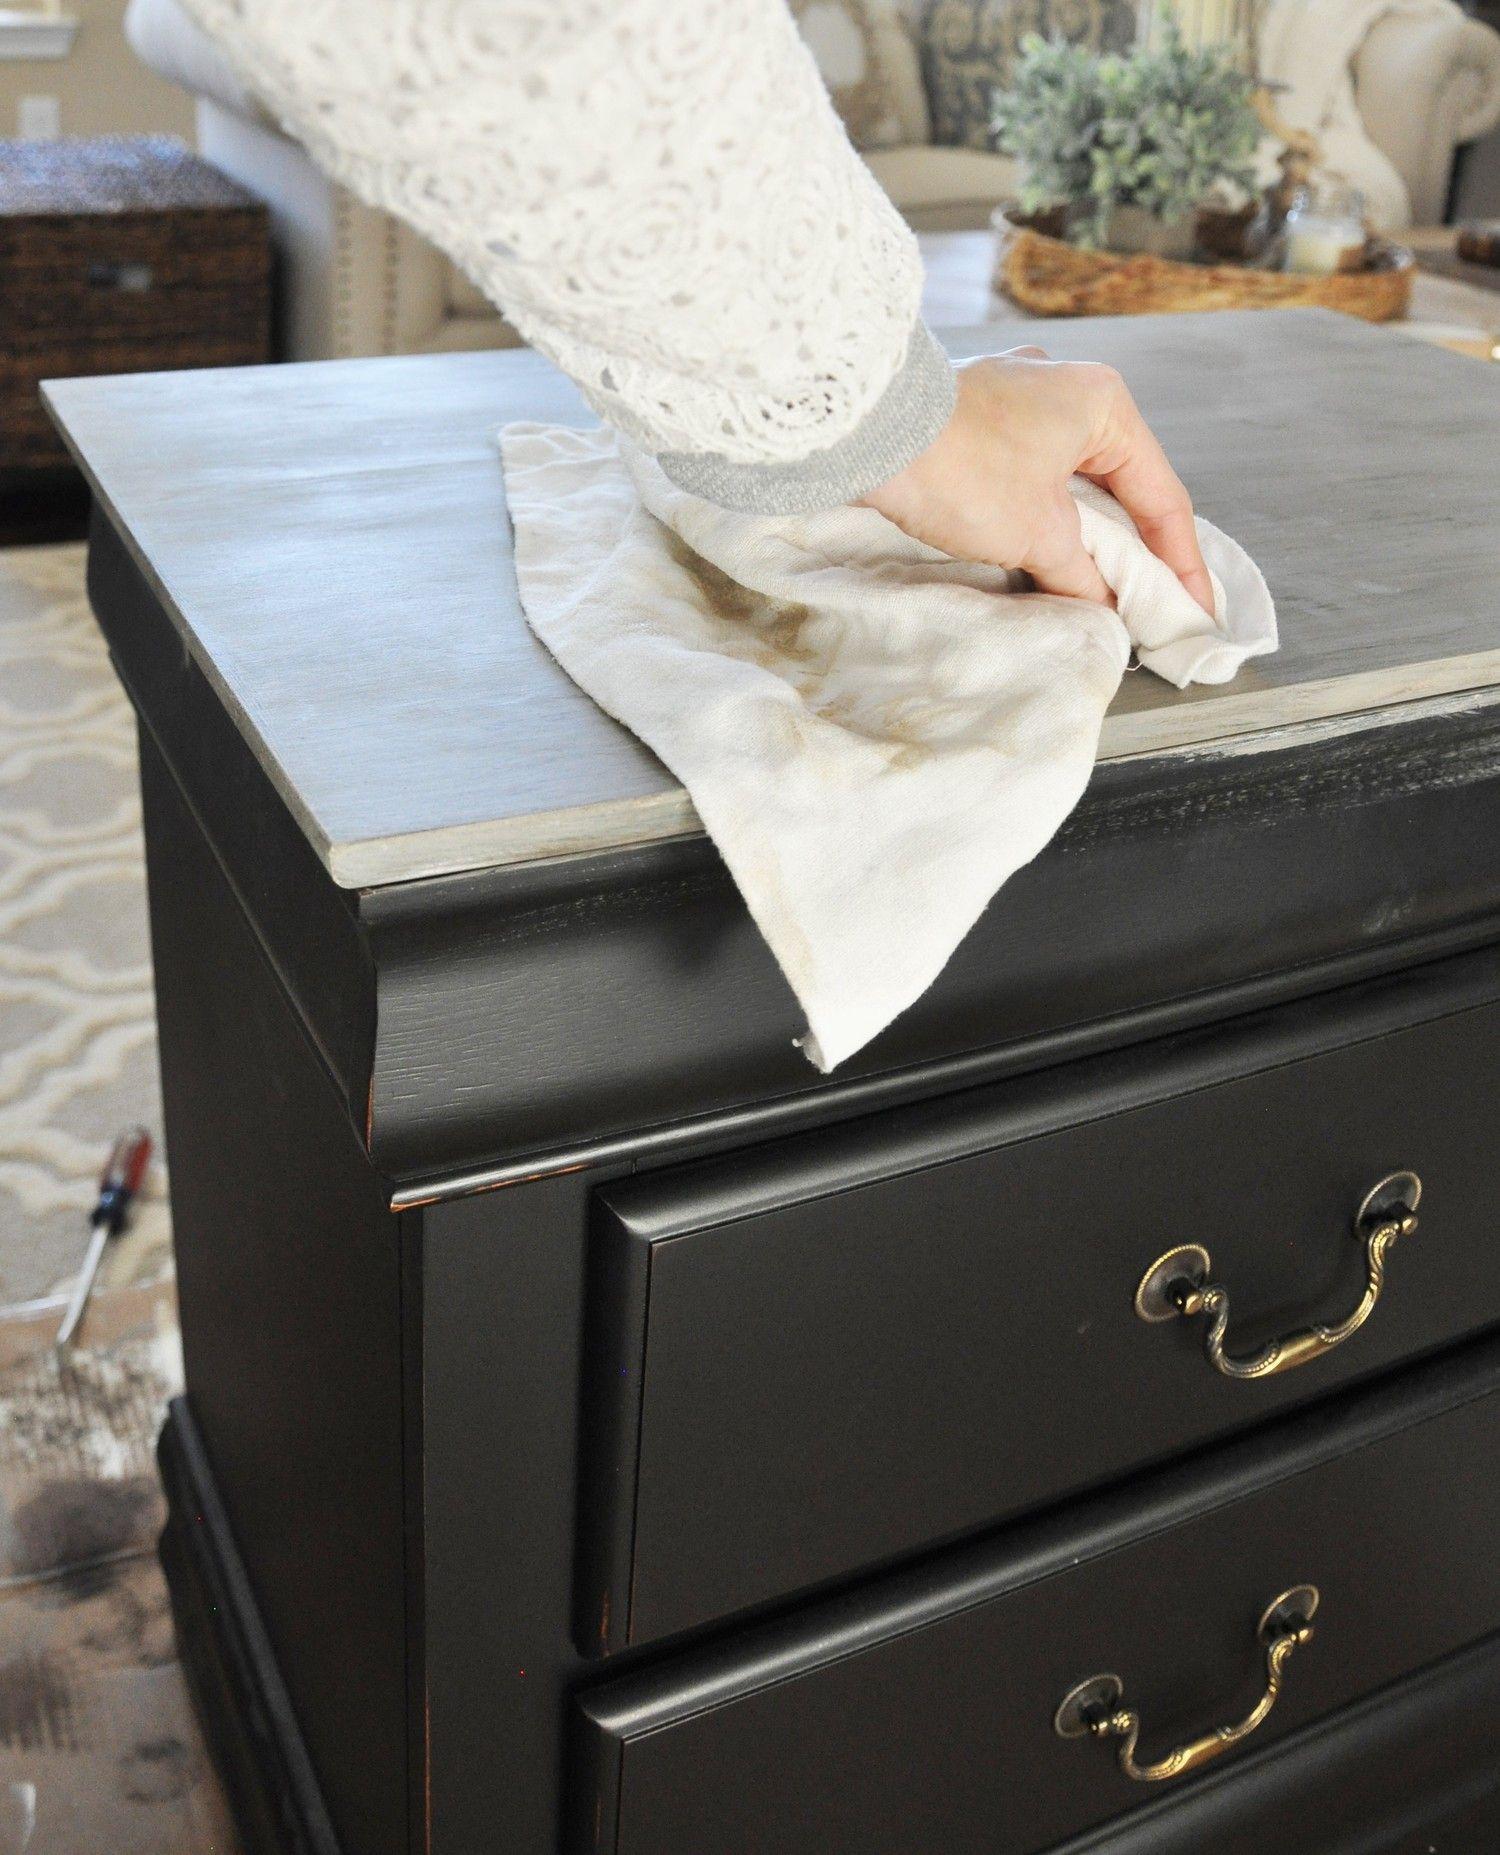 Nightstand Chalk Paint Tutorial Chalk Paint Bedroom Furniture Chalk Paint Tutorial Black Chalk Paint Furniture